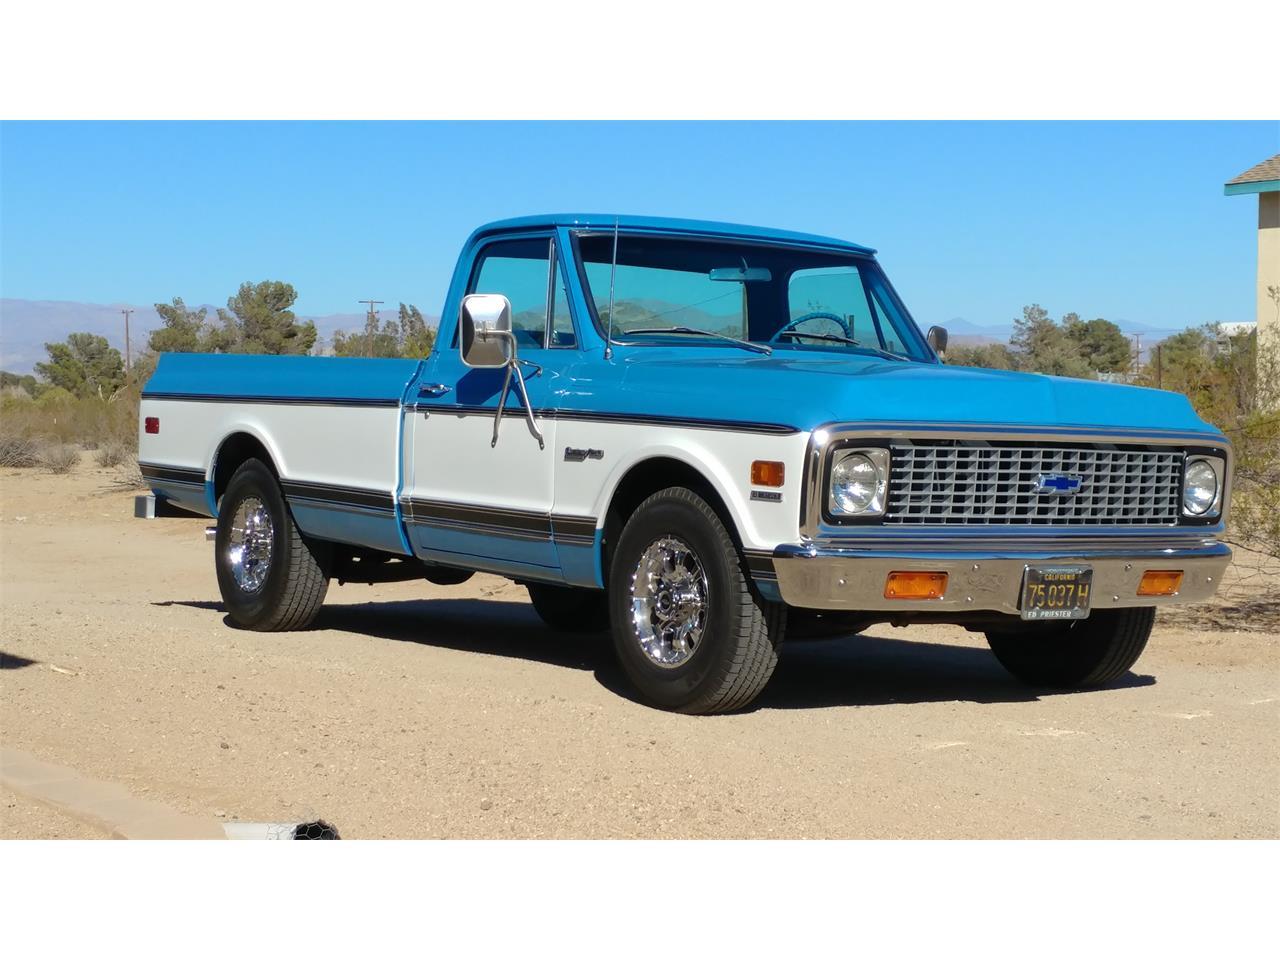 For Sale: 1971 Chevrolet C20 in Ridgecrest, California